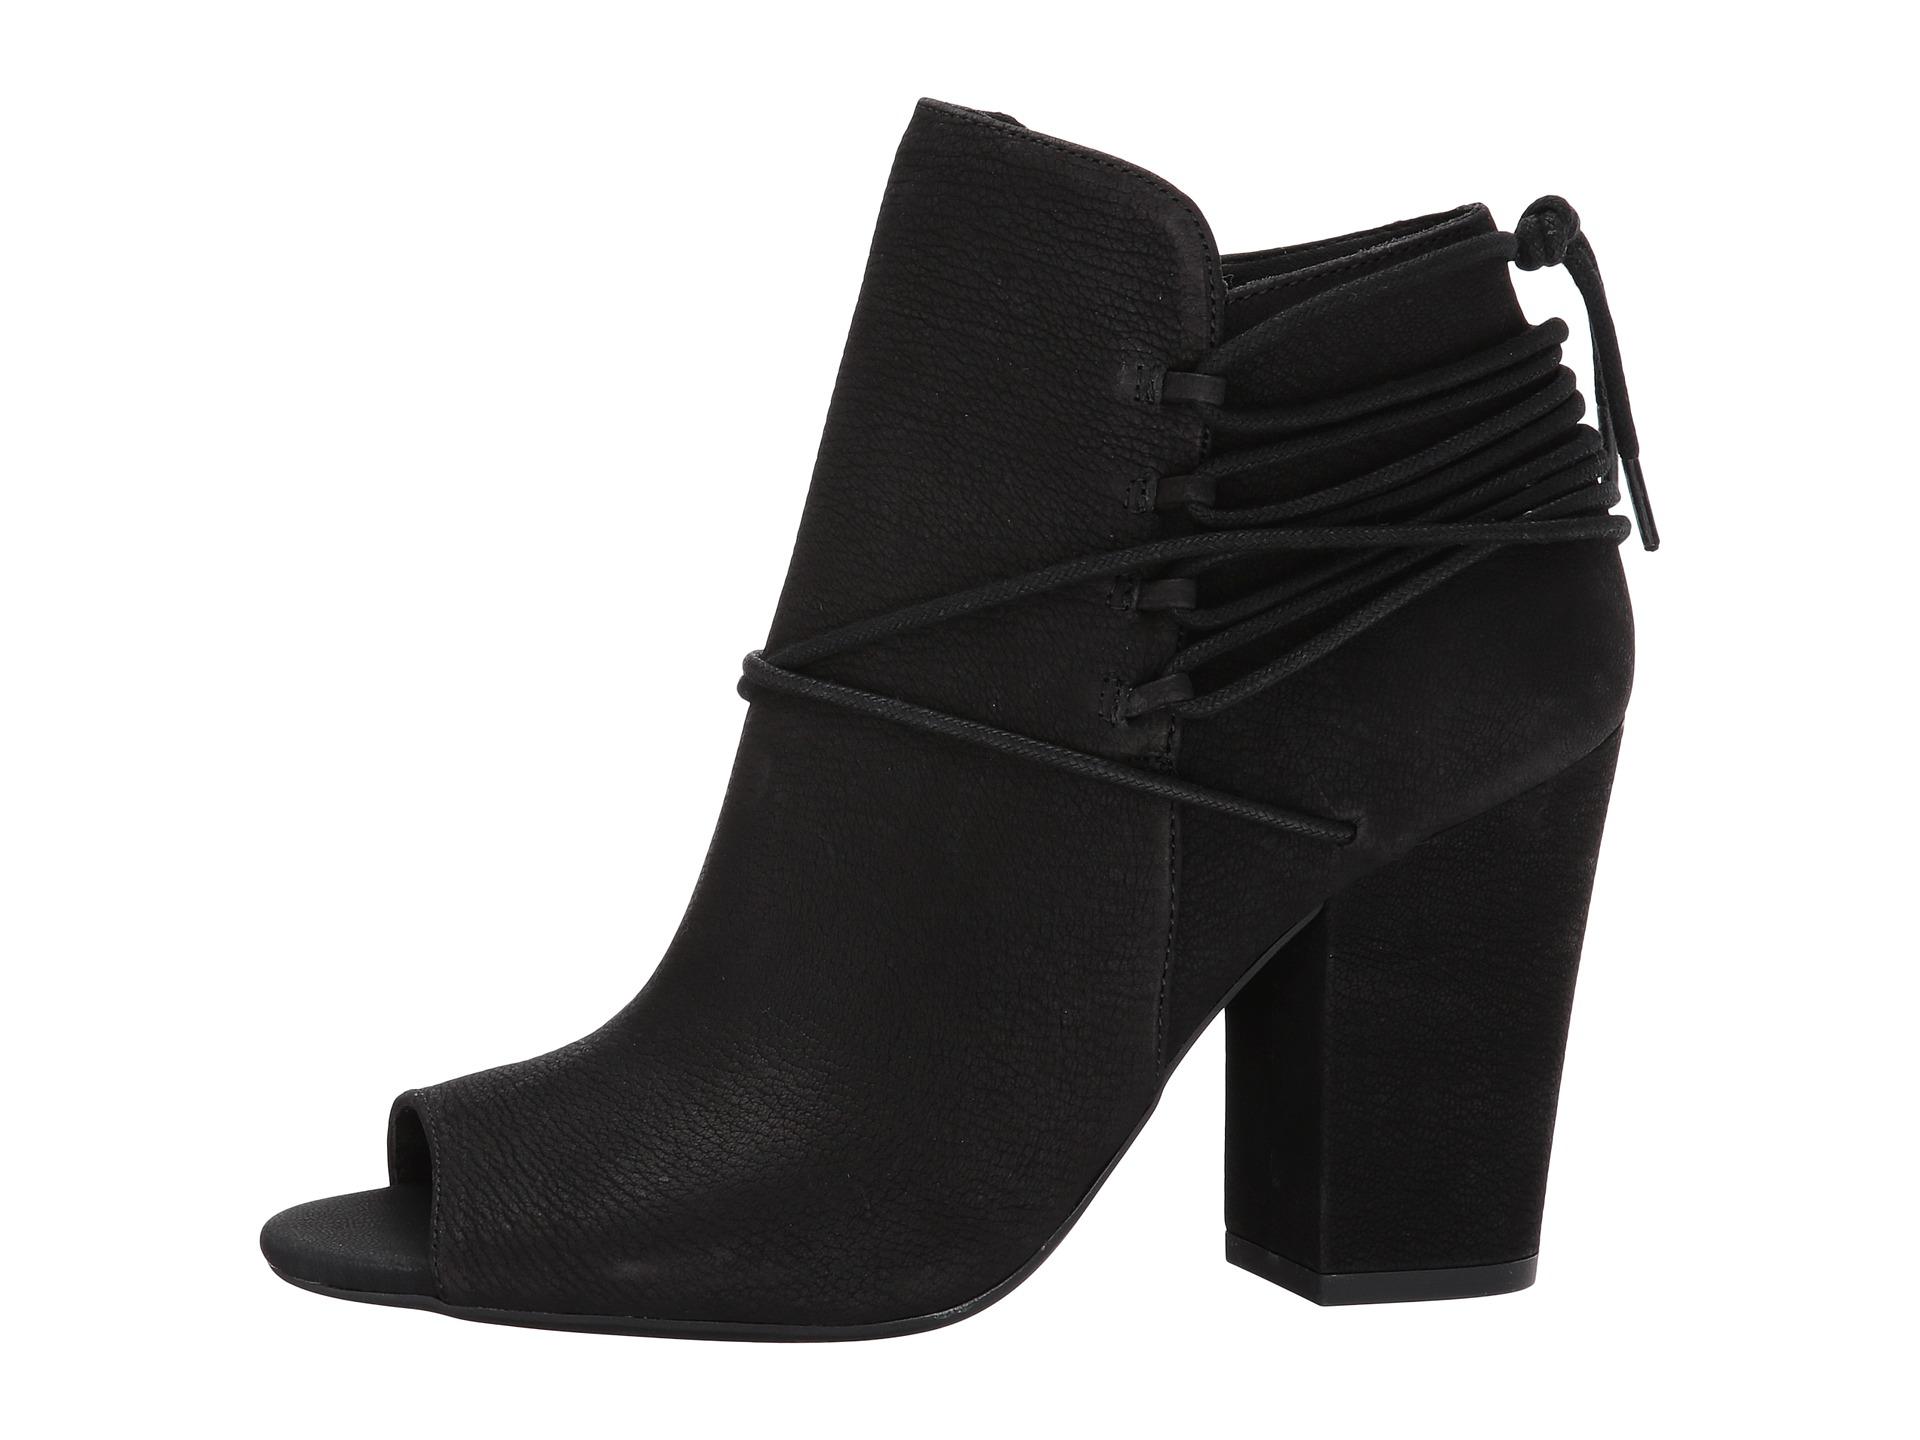 2fe6a551311 Jessica-Simpson-Womens-Remni-Open-Toe-Bootie-Shoe thumbnail